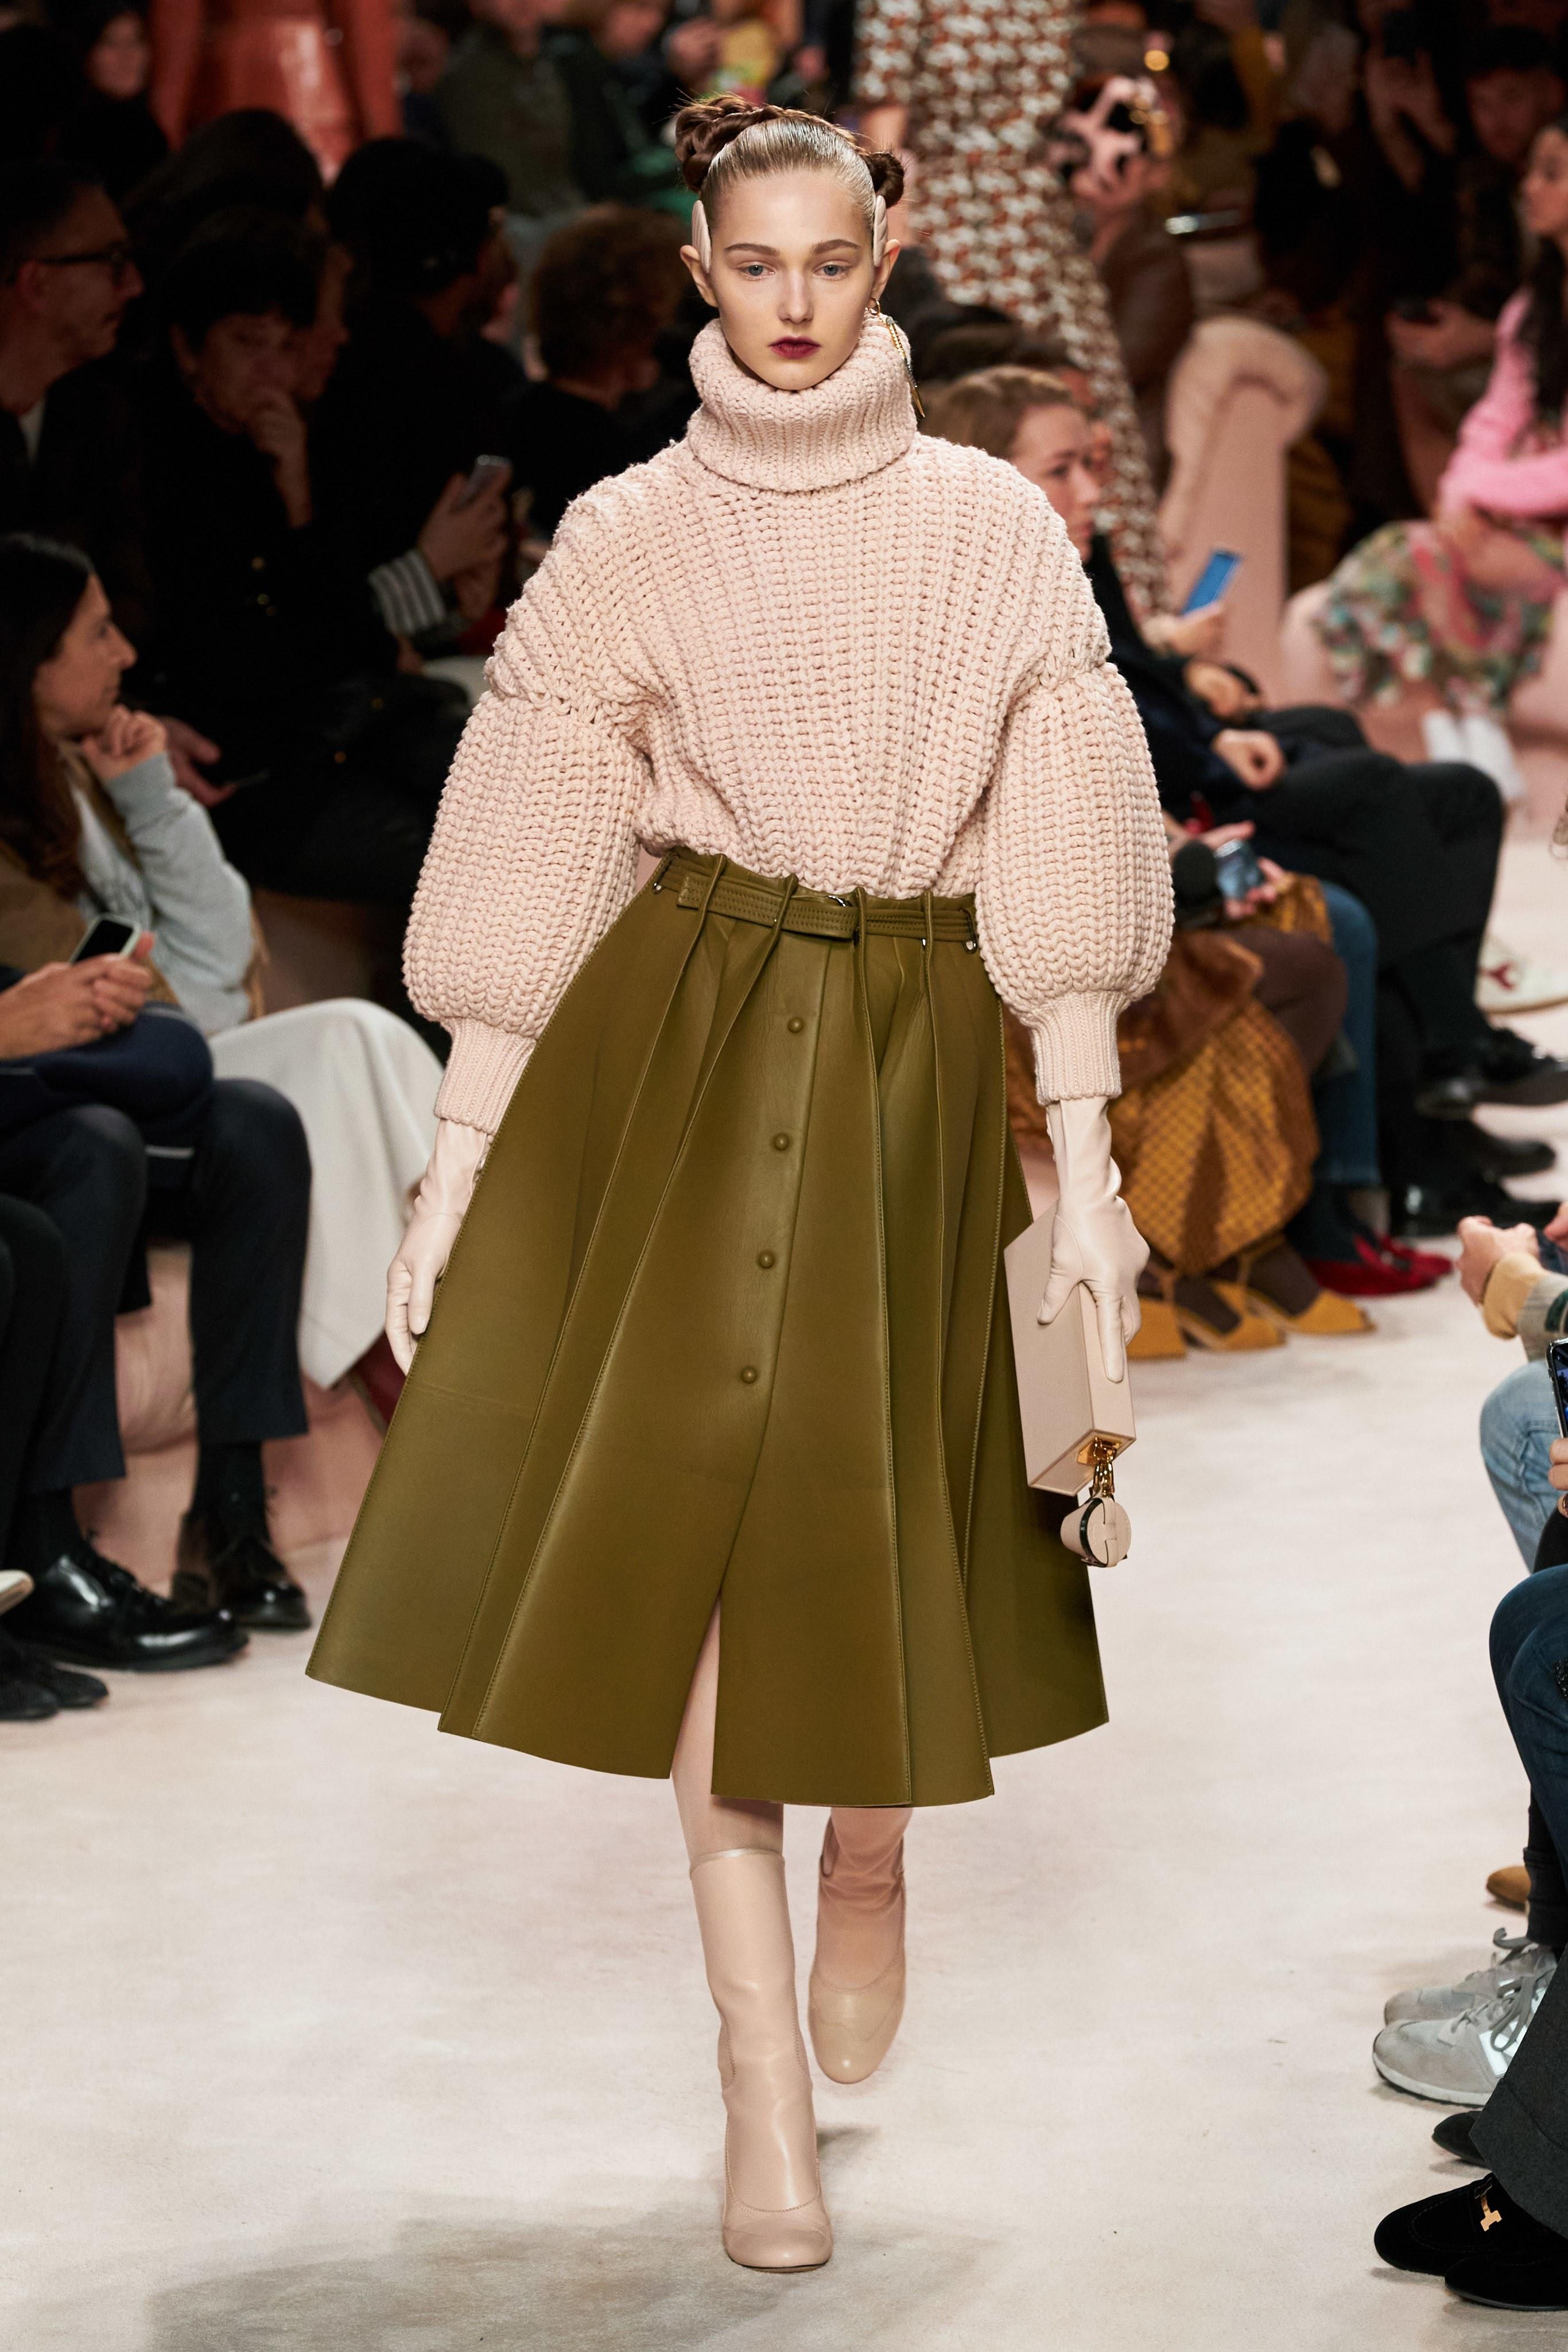 fendi fall 2020 ready to wear Milan fashion show